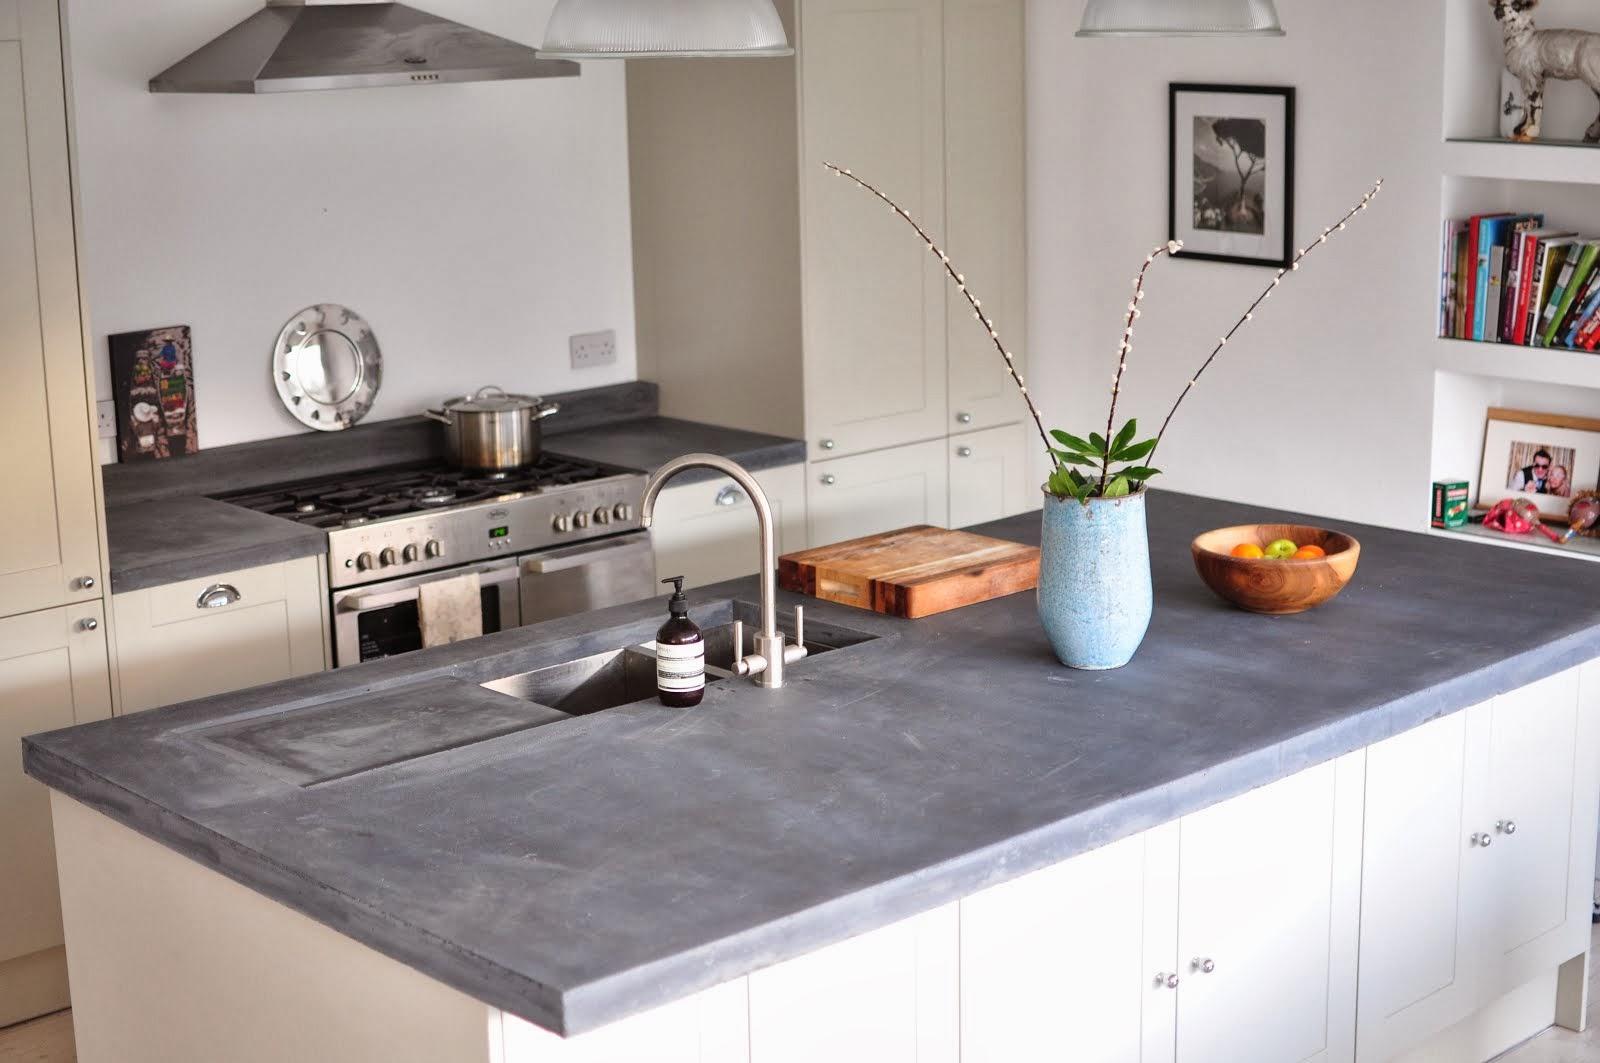 Concrete worktop in the kitchen edinburgh slate blue concrete worktop with drainer GHXZSKJ